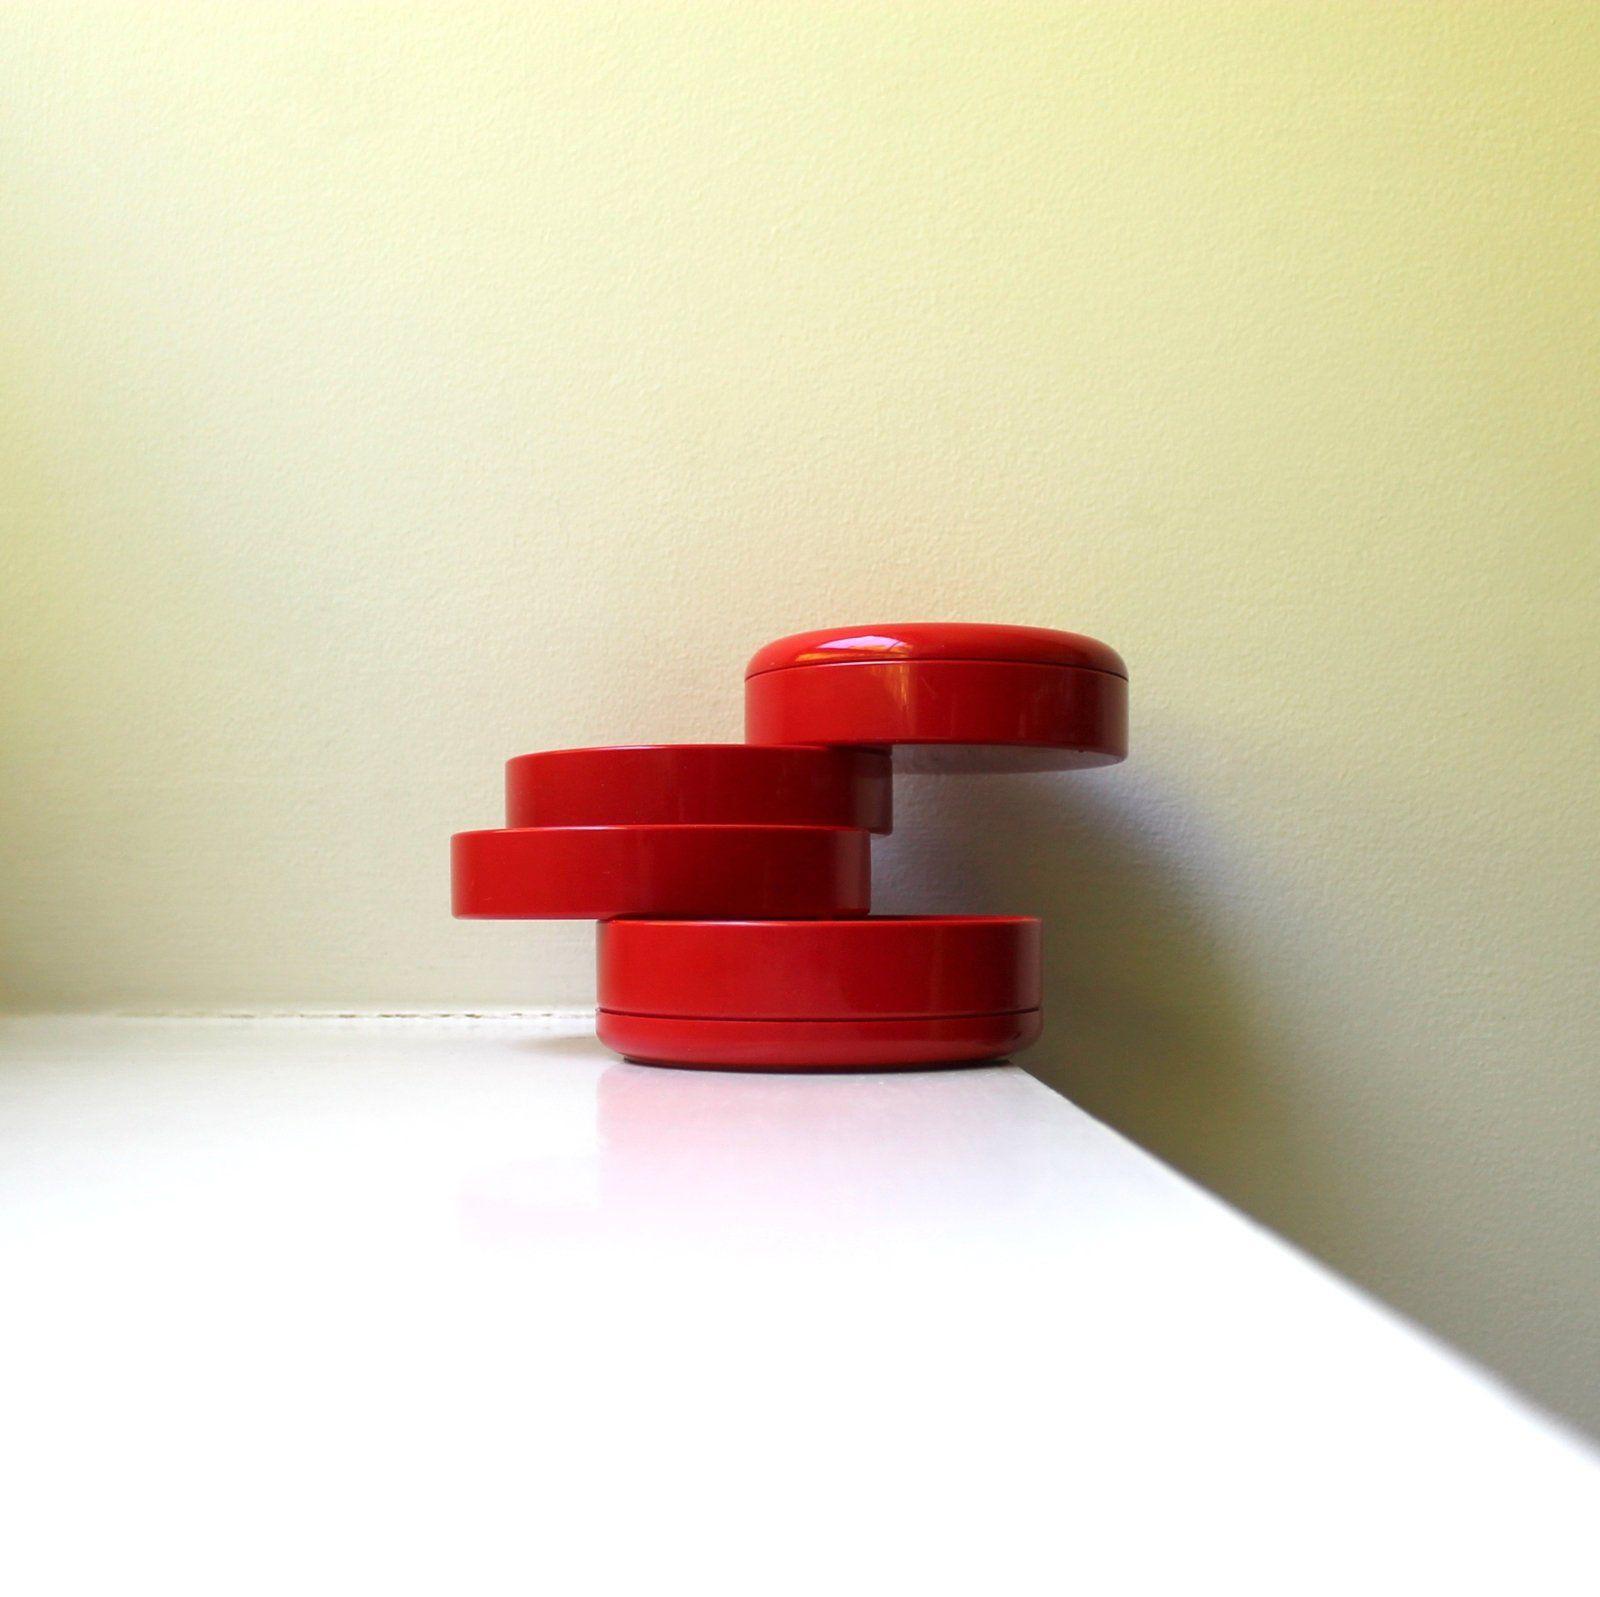 Vintage Mod Red Plastic Desk Office Organizer Jewelry Box Etsy Office Organization Interdesign Office Desk